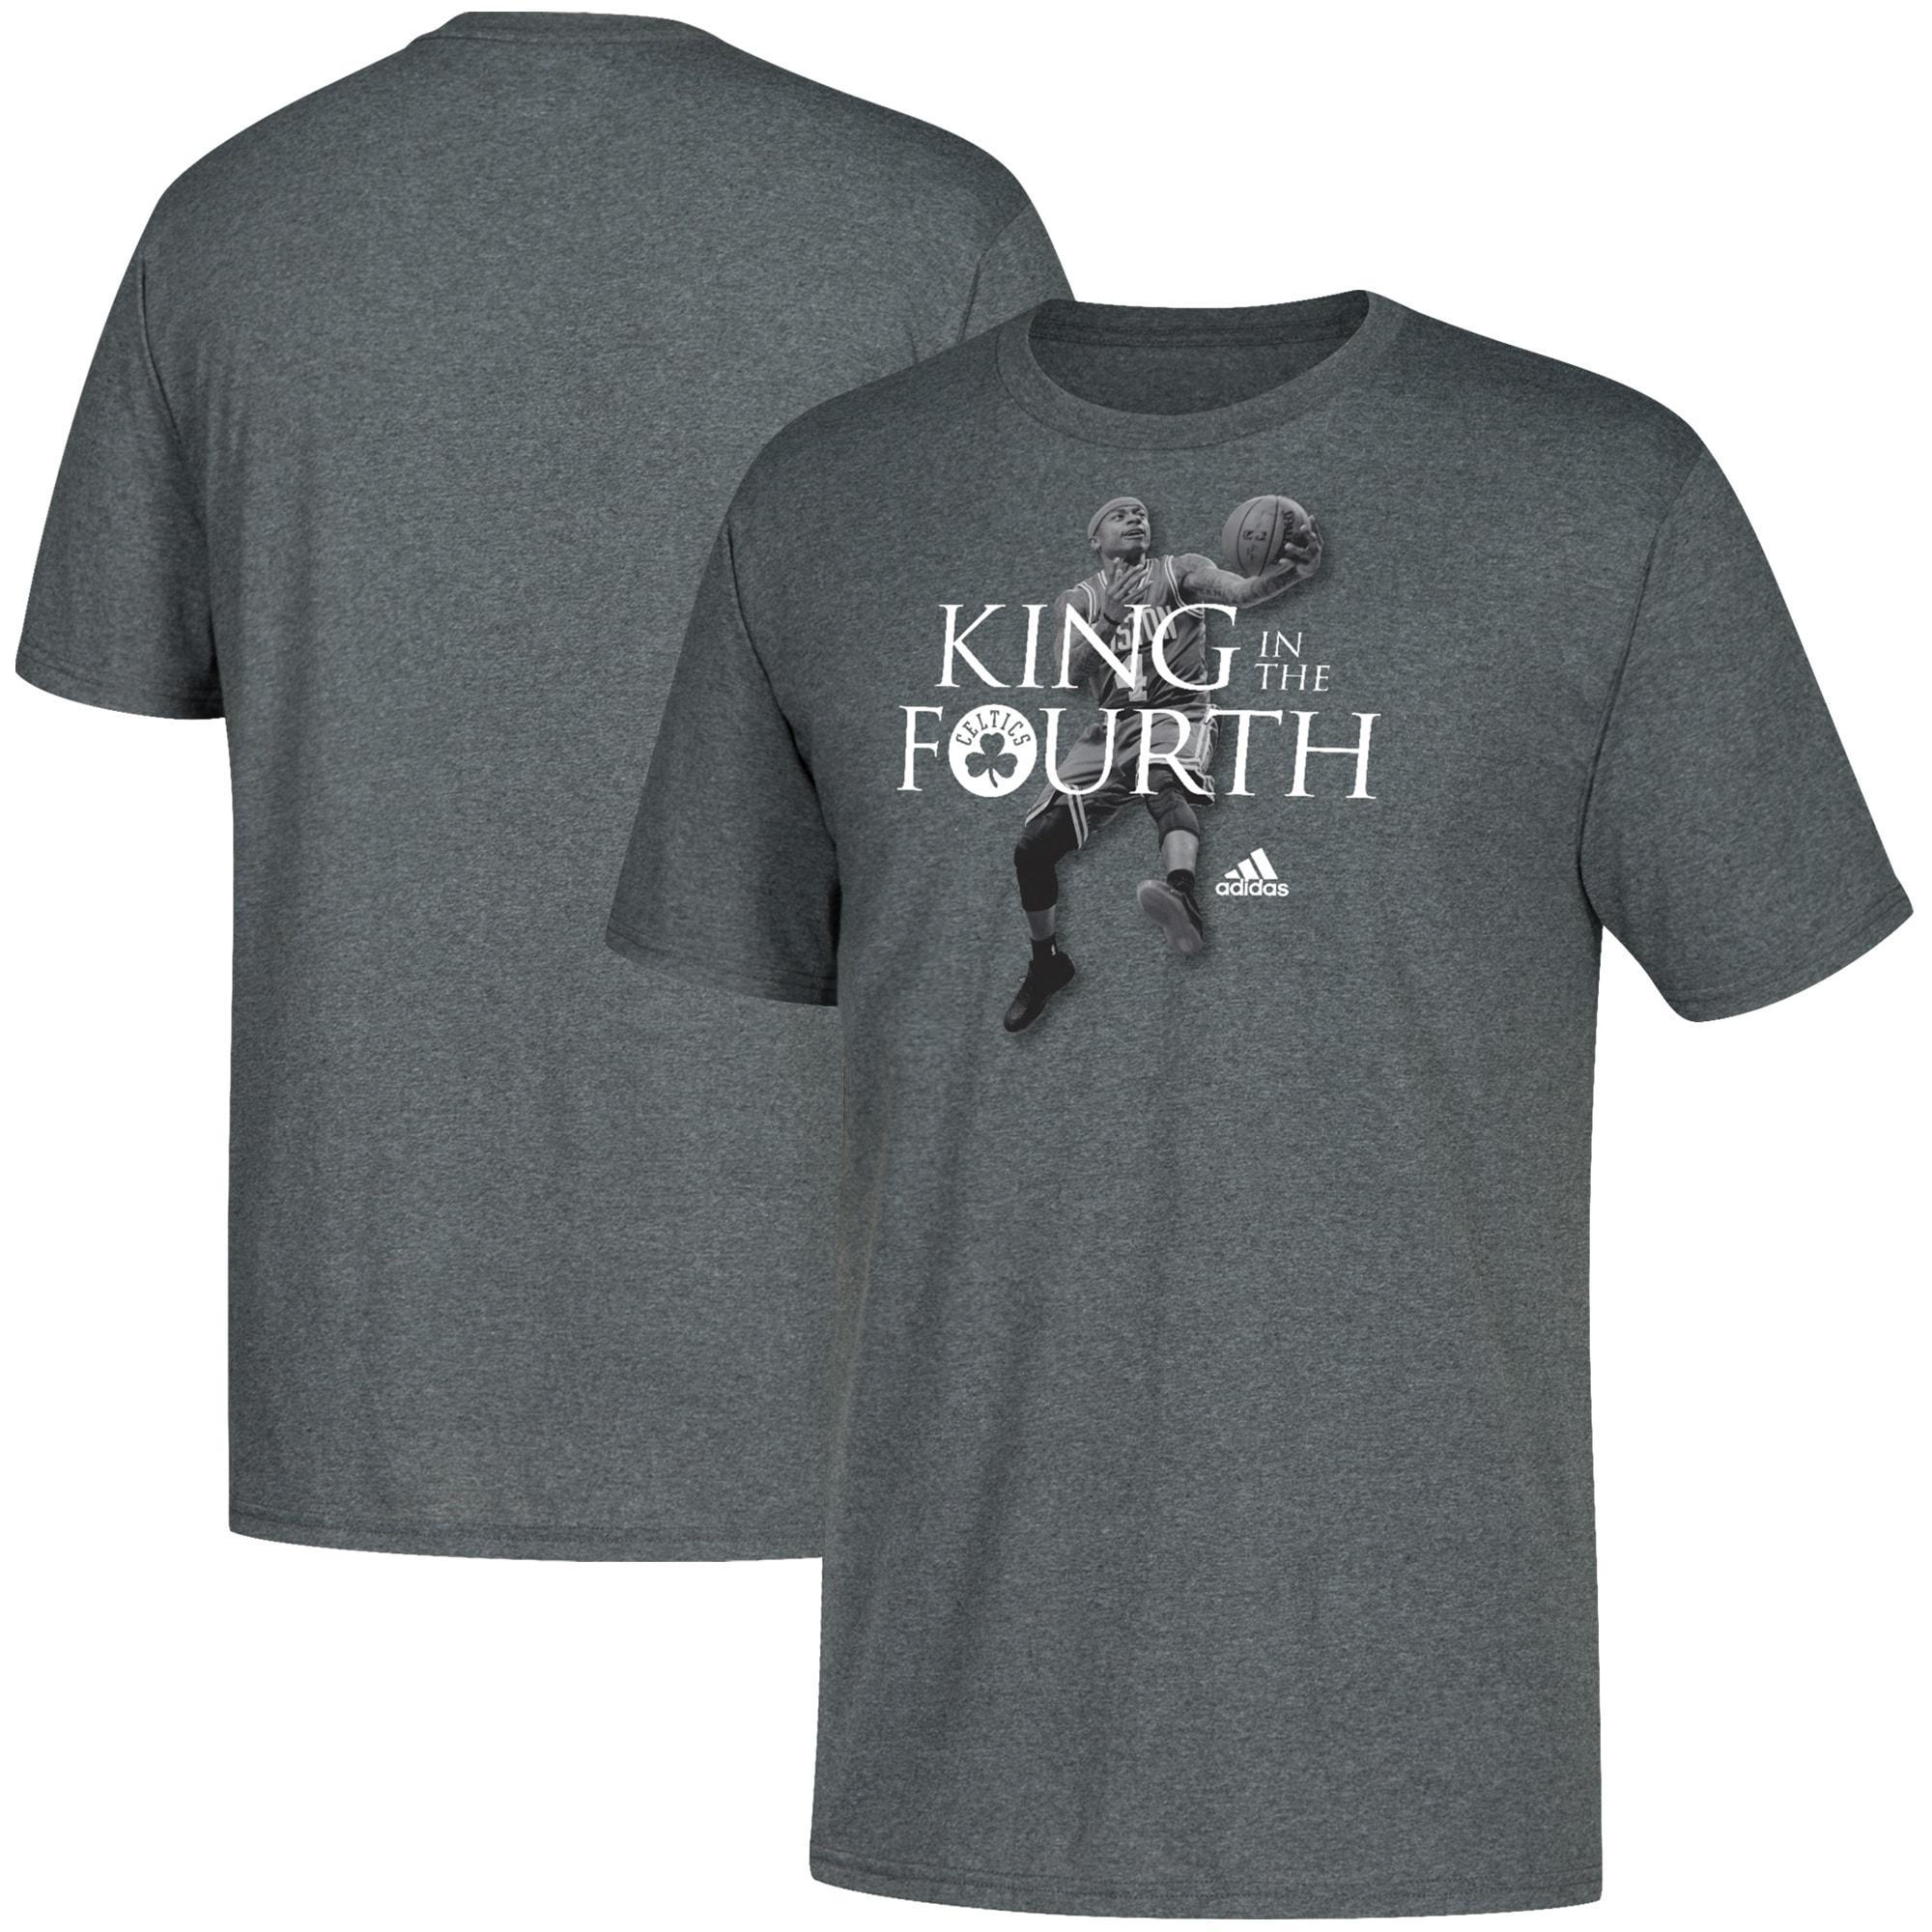 Isaiah Thomas Boston Celtics adidas King in the Fourth T-Shirt - Charcoal